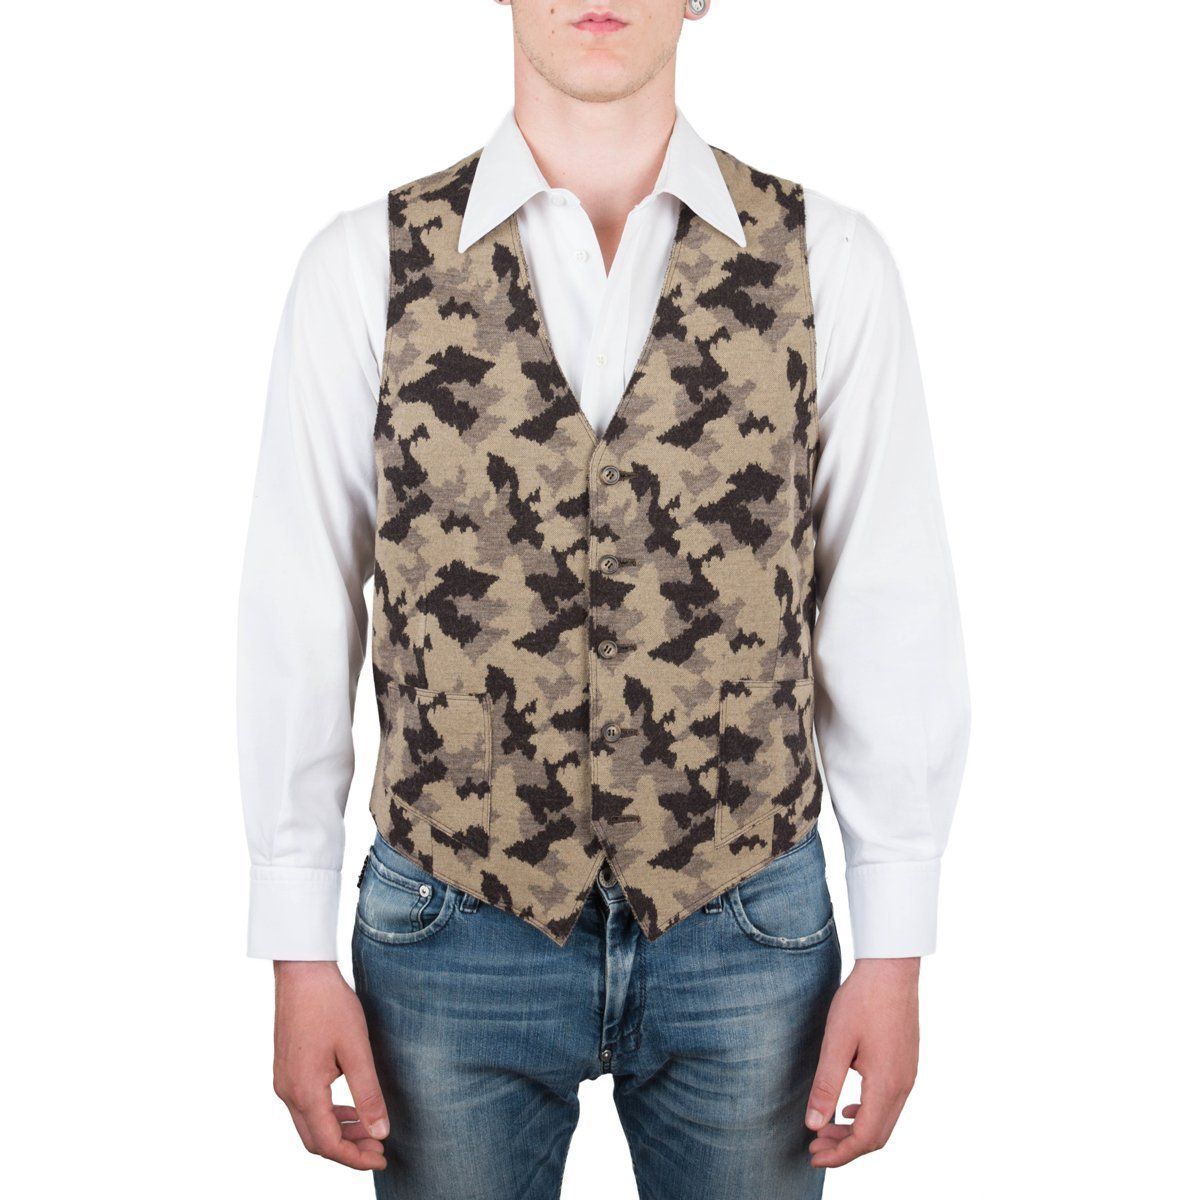 Vest, Gilet, Waistcoat, Knitwear, Men, Boy, Brown, Camel, Army, Camo, Camouflage, Wool, Buttons, Pockets, Casual, Sporty, Sleeveless, Slimfit, Italian Fabric, Italian Style, Made in Italy, Handmade